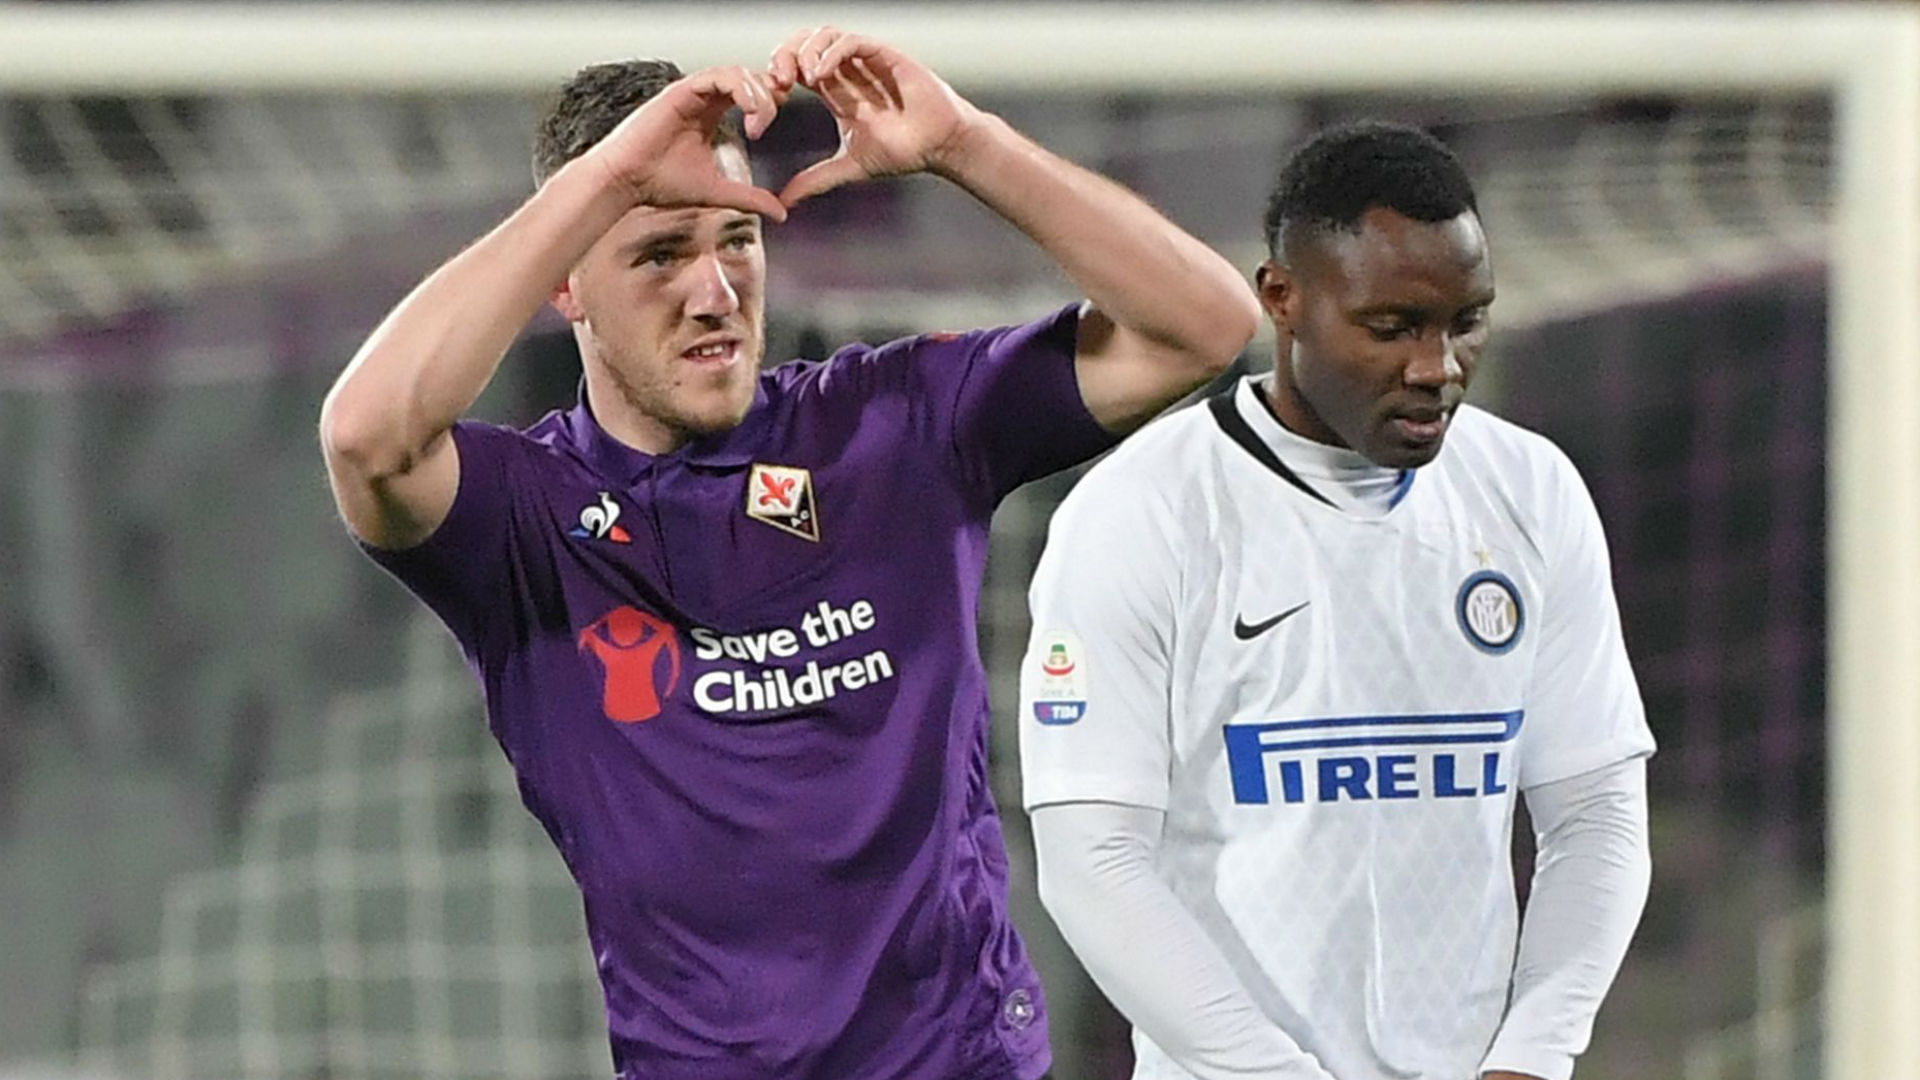 VIDEO-Highlights, Serie A: Fiorentina - Inter Mailand 3:3